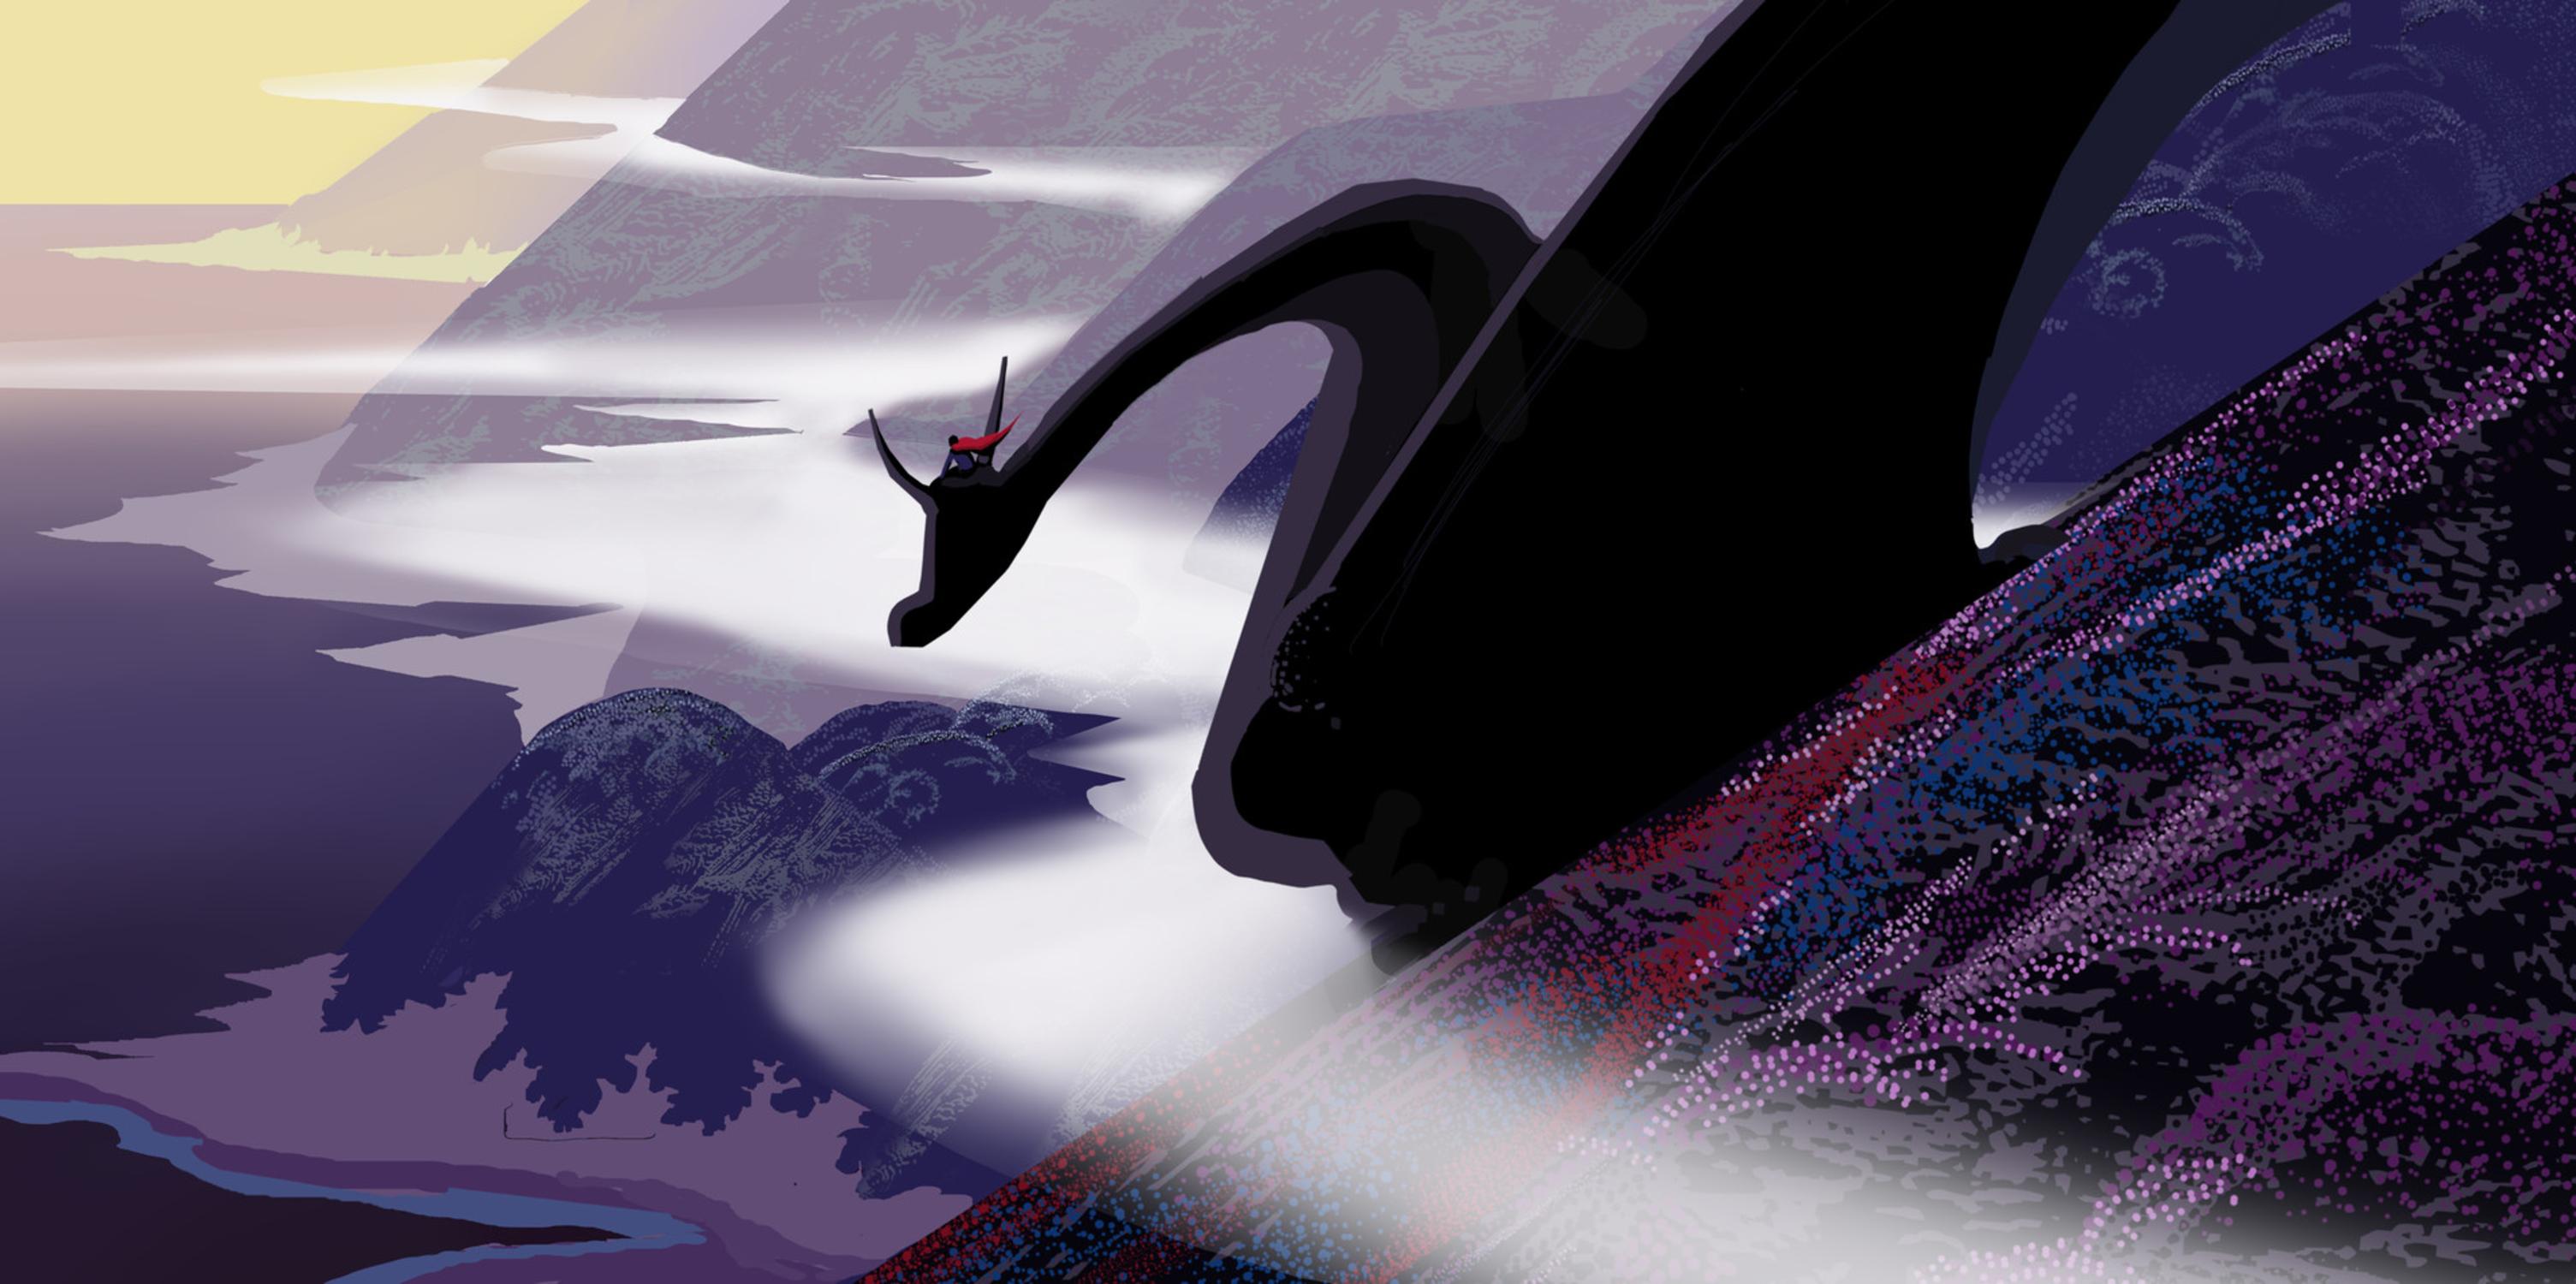 Dragon Raider Artwork by Qianjiao Ma